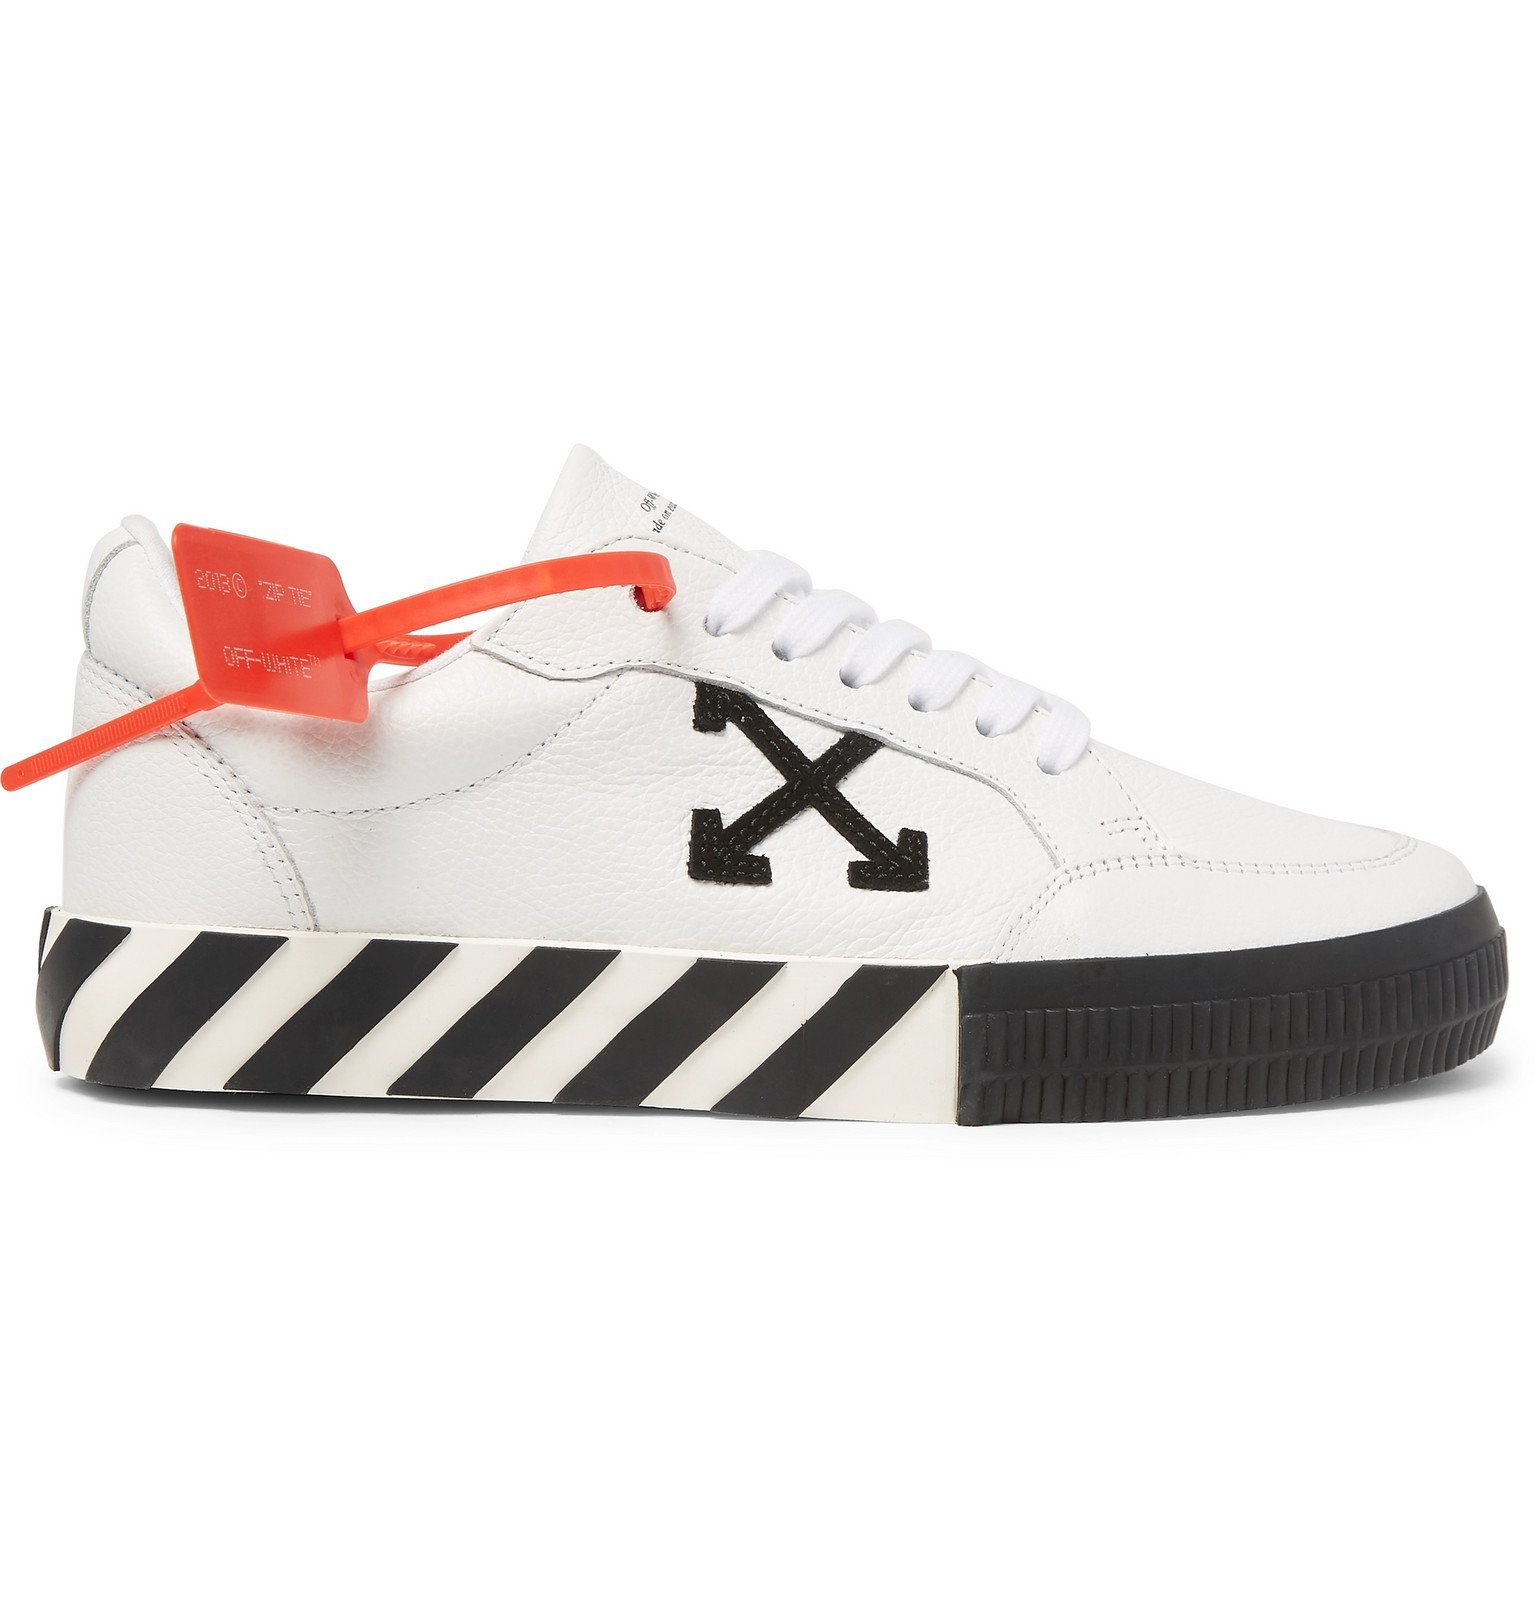 Off-White - Logo-Appliquéd Full-Grain Leather Sneakers - White